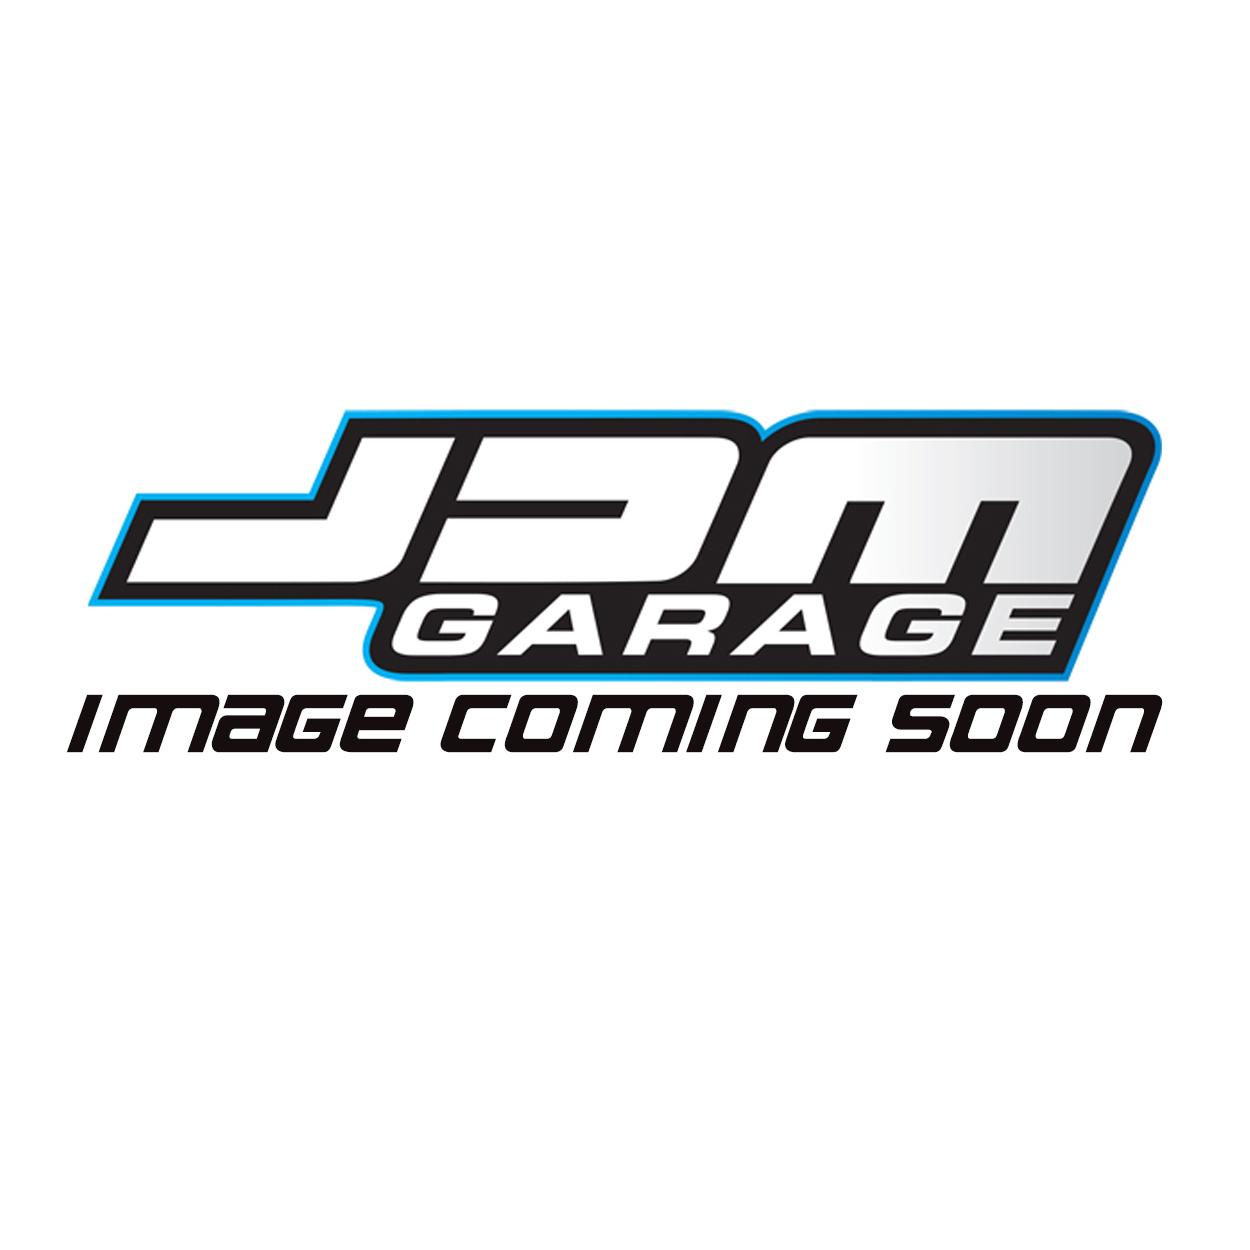 OE Rear Wheel Bearing Hub Kit Nissan Skyline R32 R33 GTST R34 GT / Laurel C33 C34 C35 / Silvia S13 180SX S14 200SX S15 - 0282-C35RM